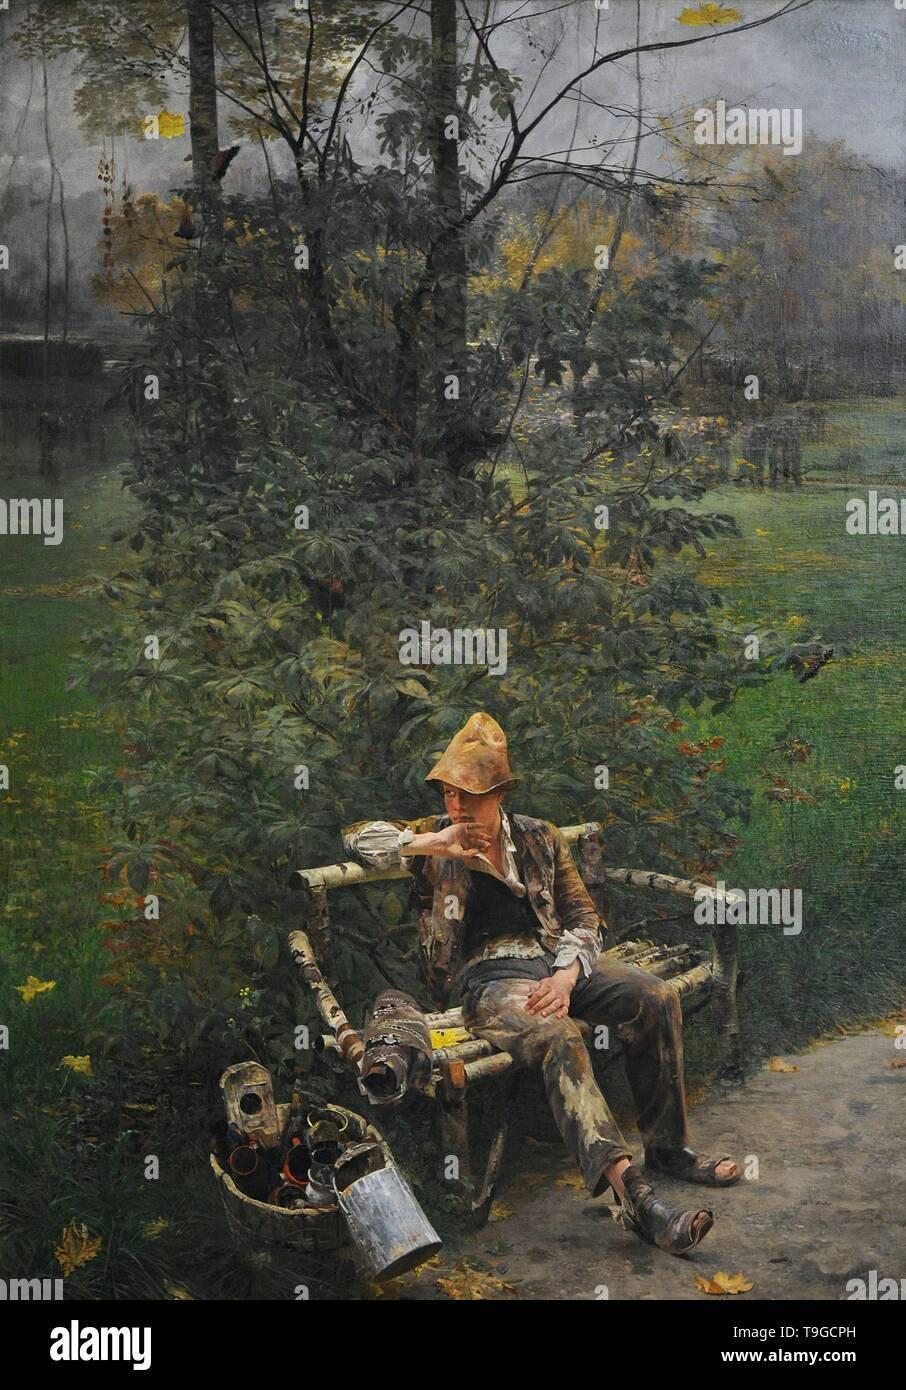 Jacek Malczewski (1854-1929). Pintor polaco. Introducción, 1890. Galería de Arte Polaco del siglo XIX (Lonja de los Paños, Sukiennice). Museo Nacional de Cracovia. Polonia. - Stock Image